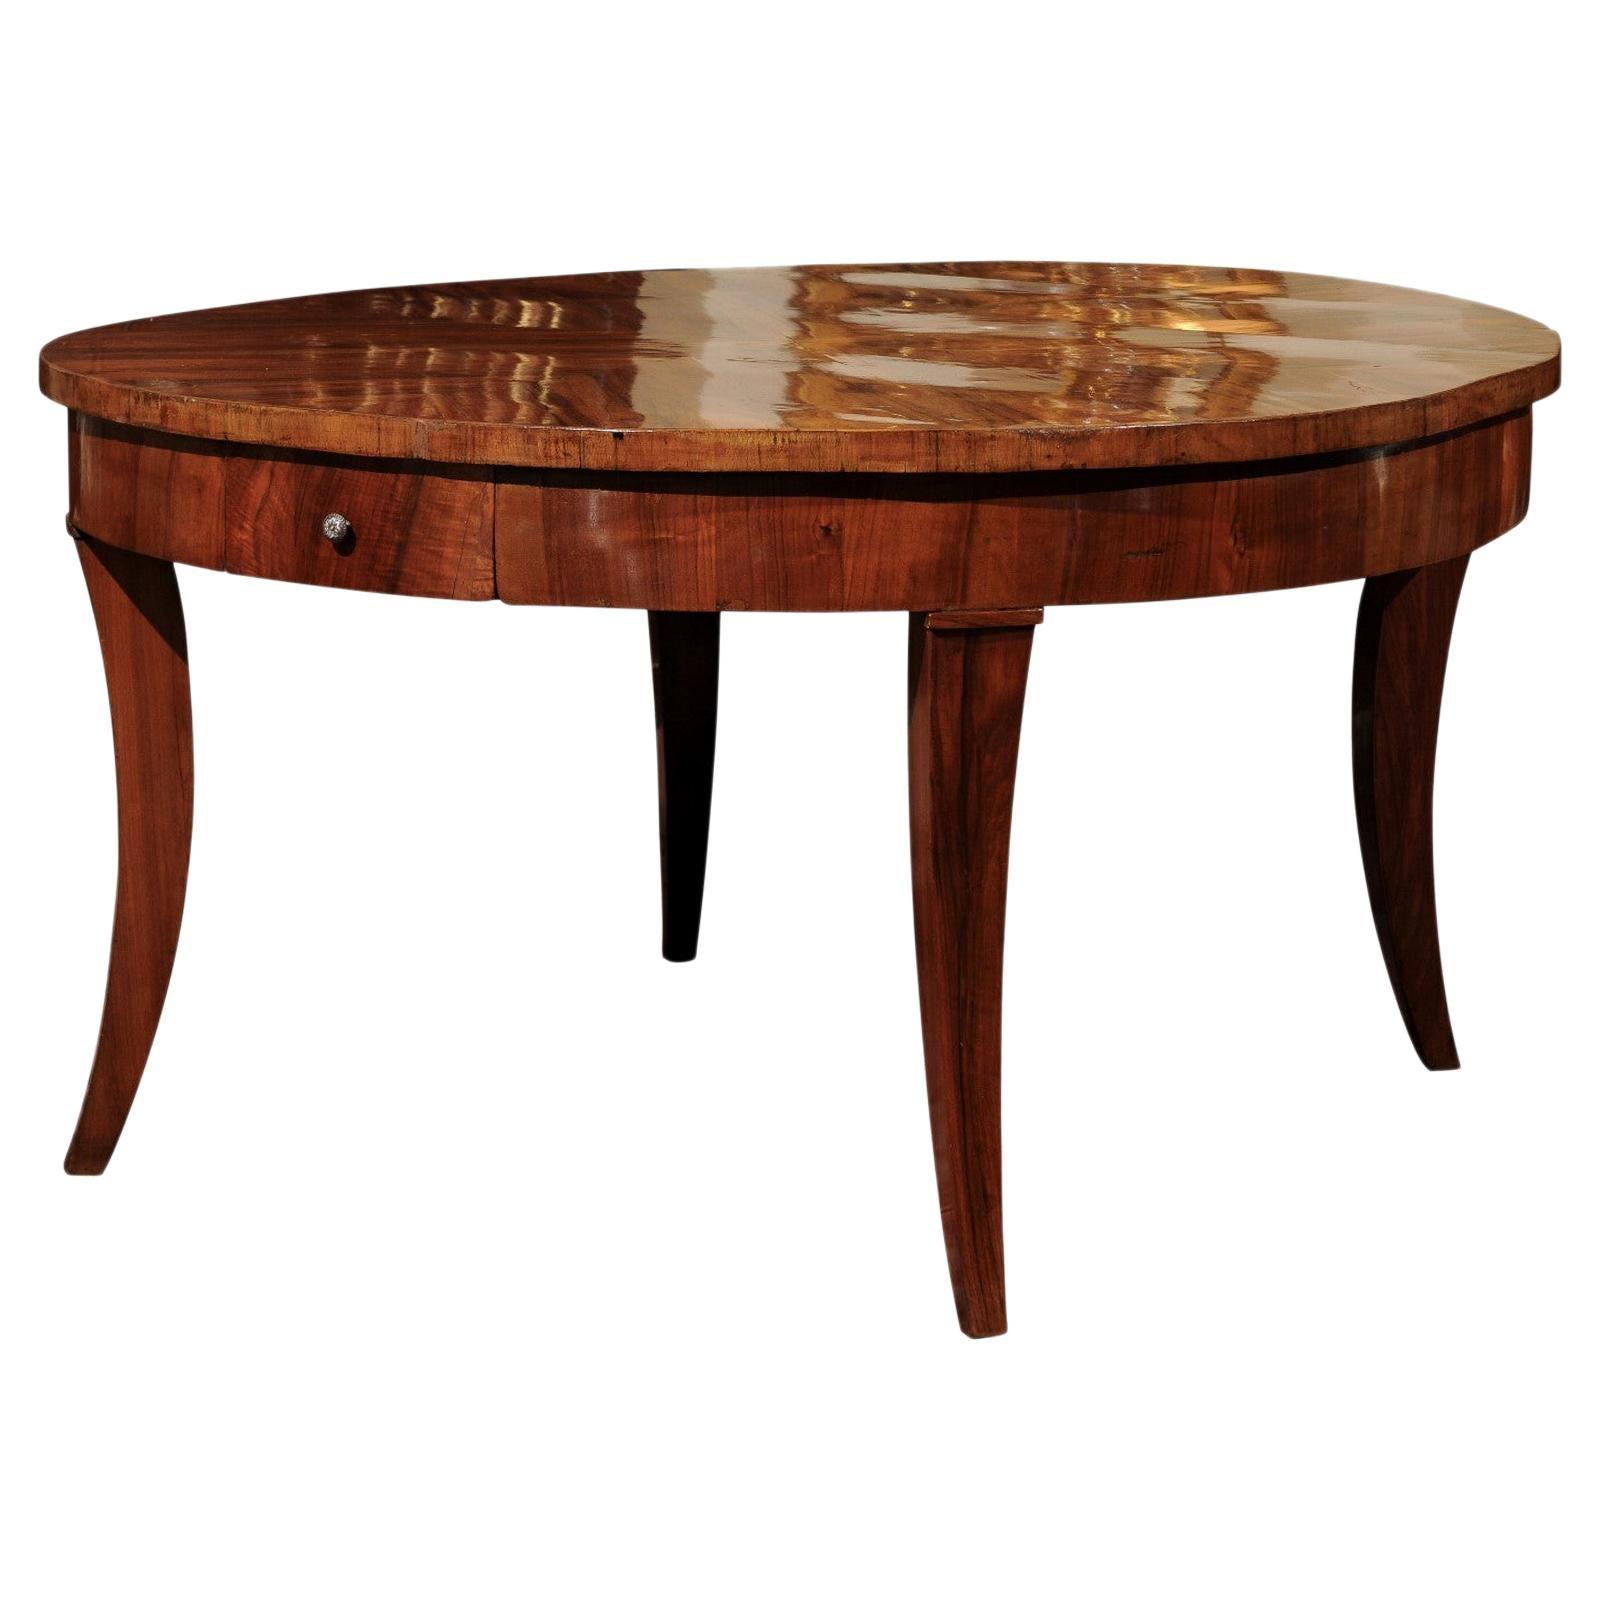 Large 19th Century Italian Walnut Round Dining or Center Table